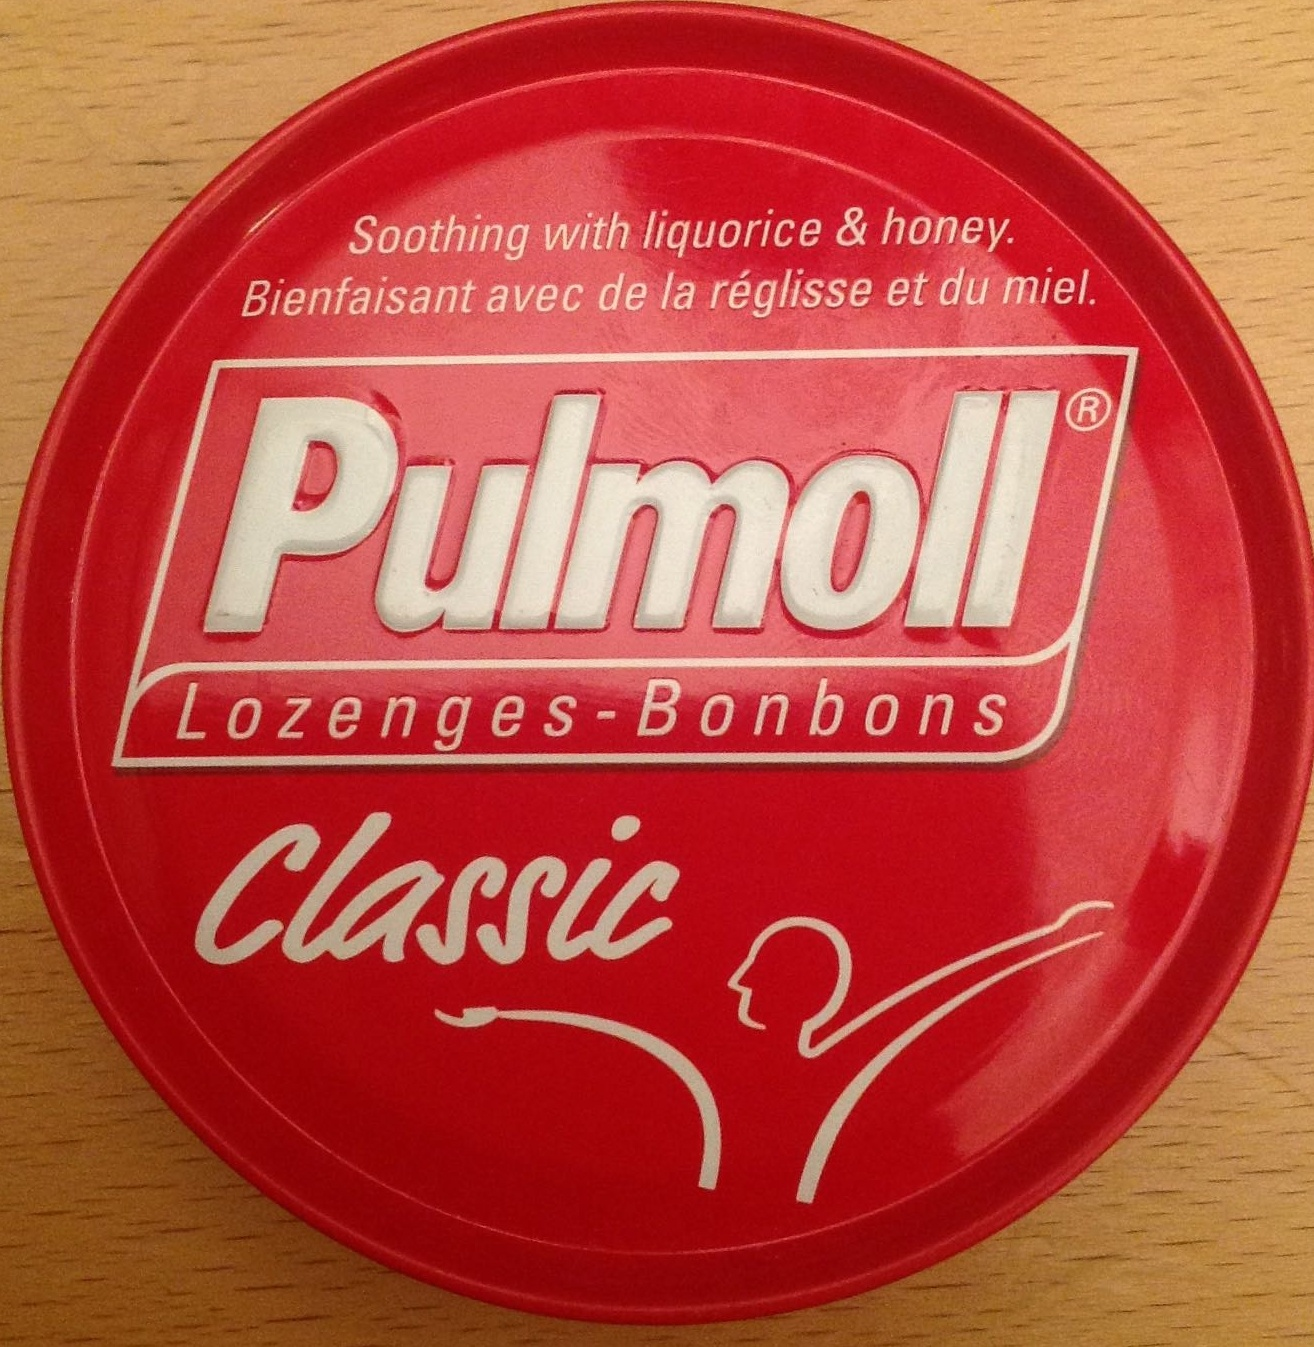 pulmoll pastilles sucer classic rouge 75g 75 g e. Black Bedroom Furniture Sets. Home Design Ideas